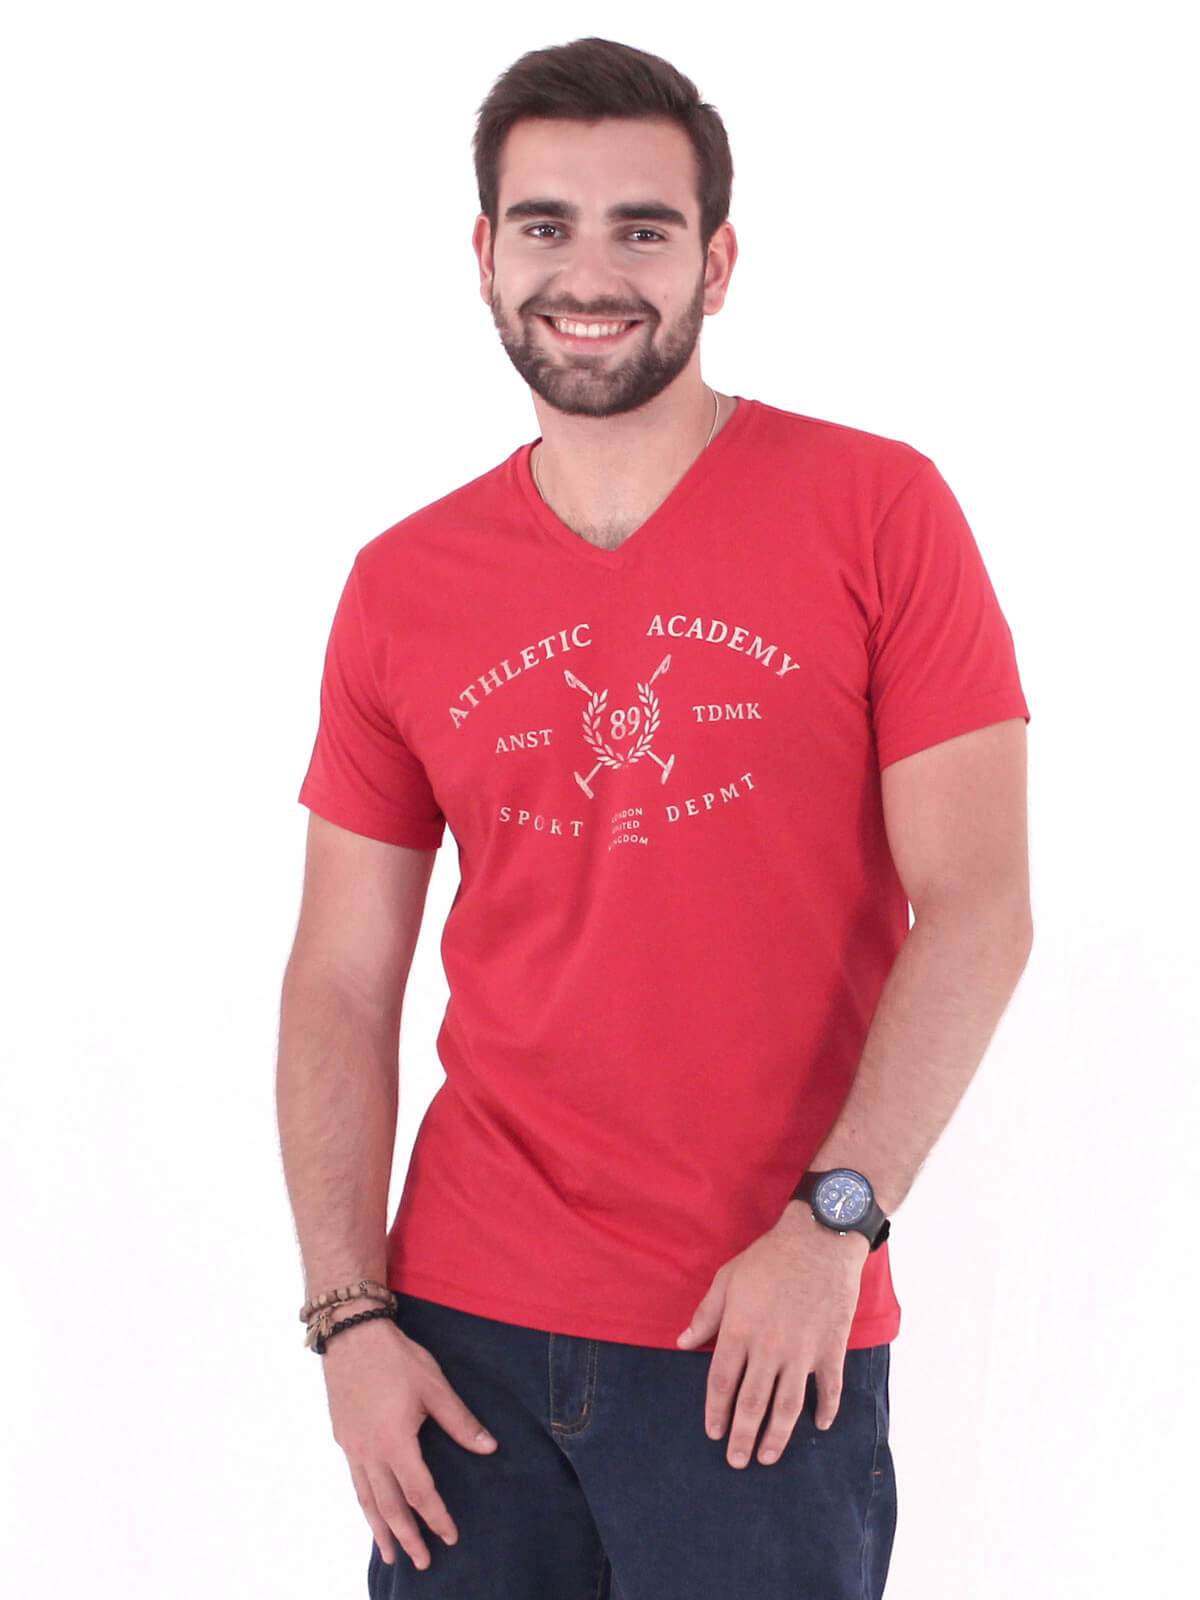 Camiseta Masculina Slim Fit Decote V. Manga Curta Estampada Vermelho